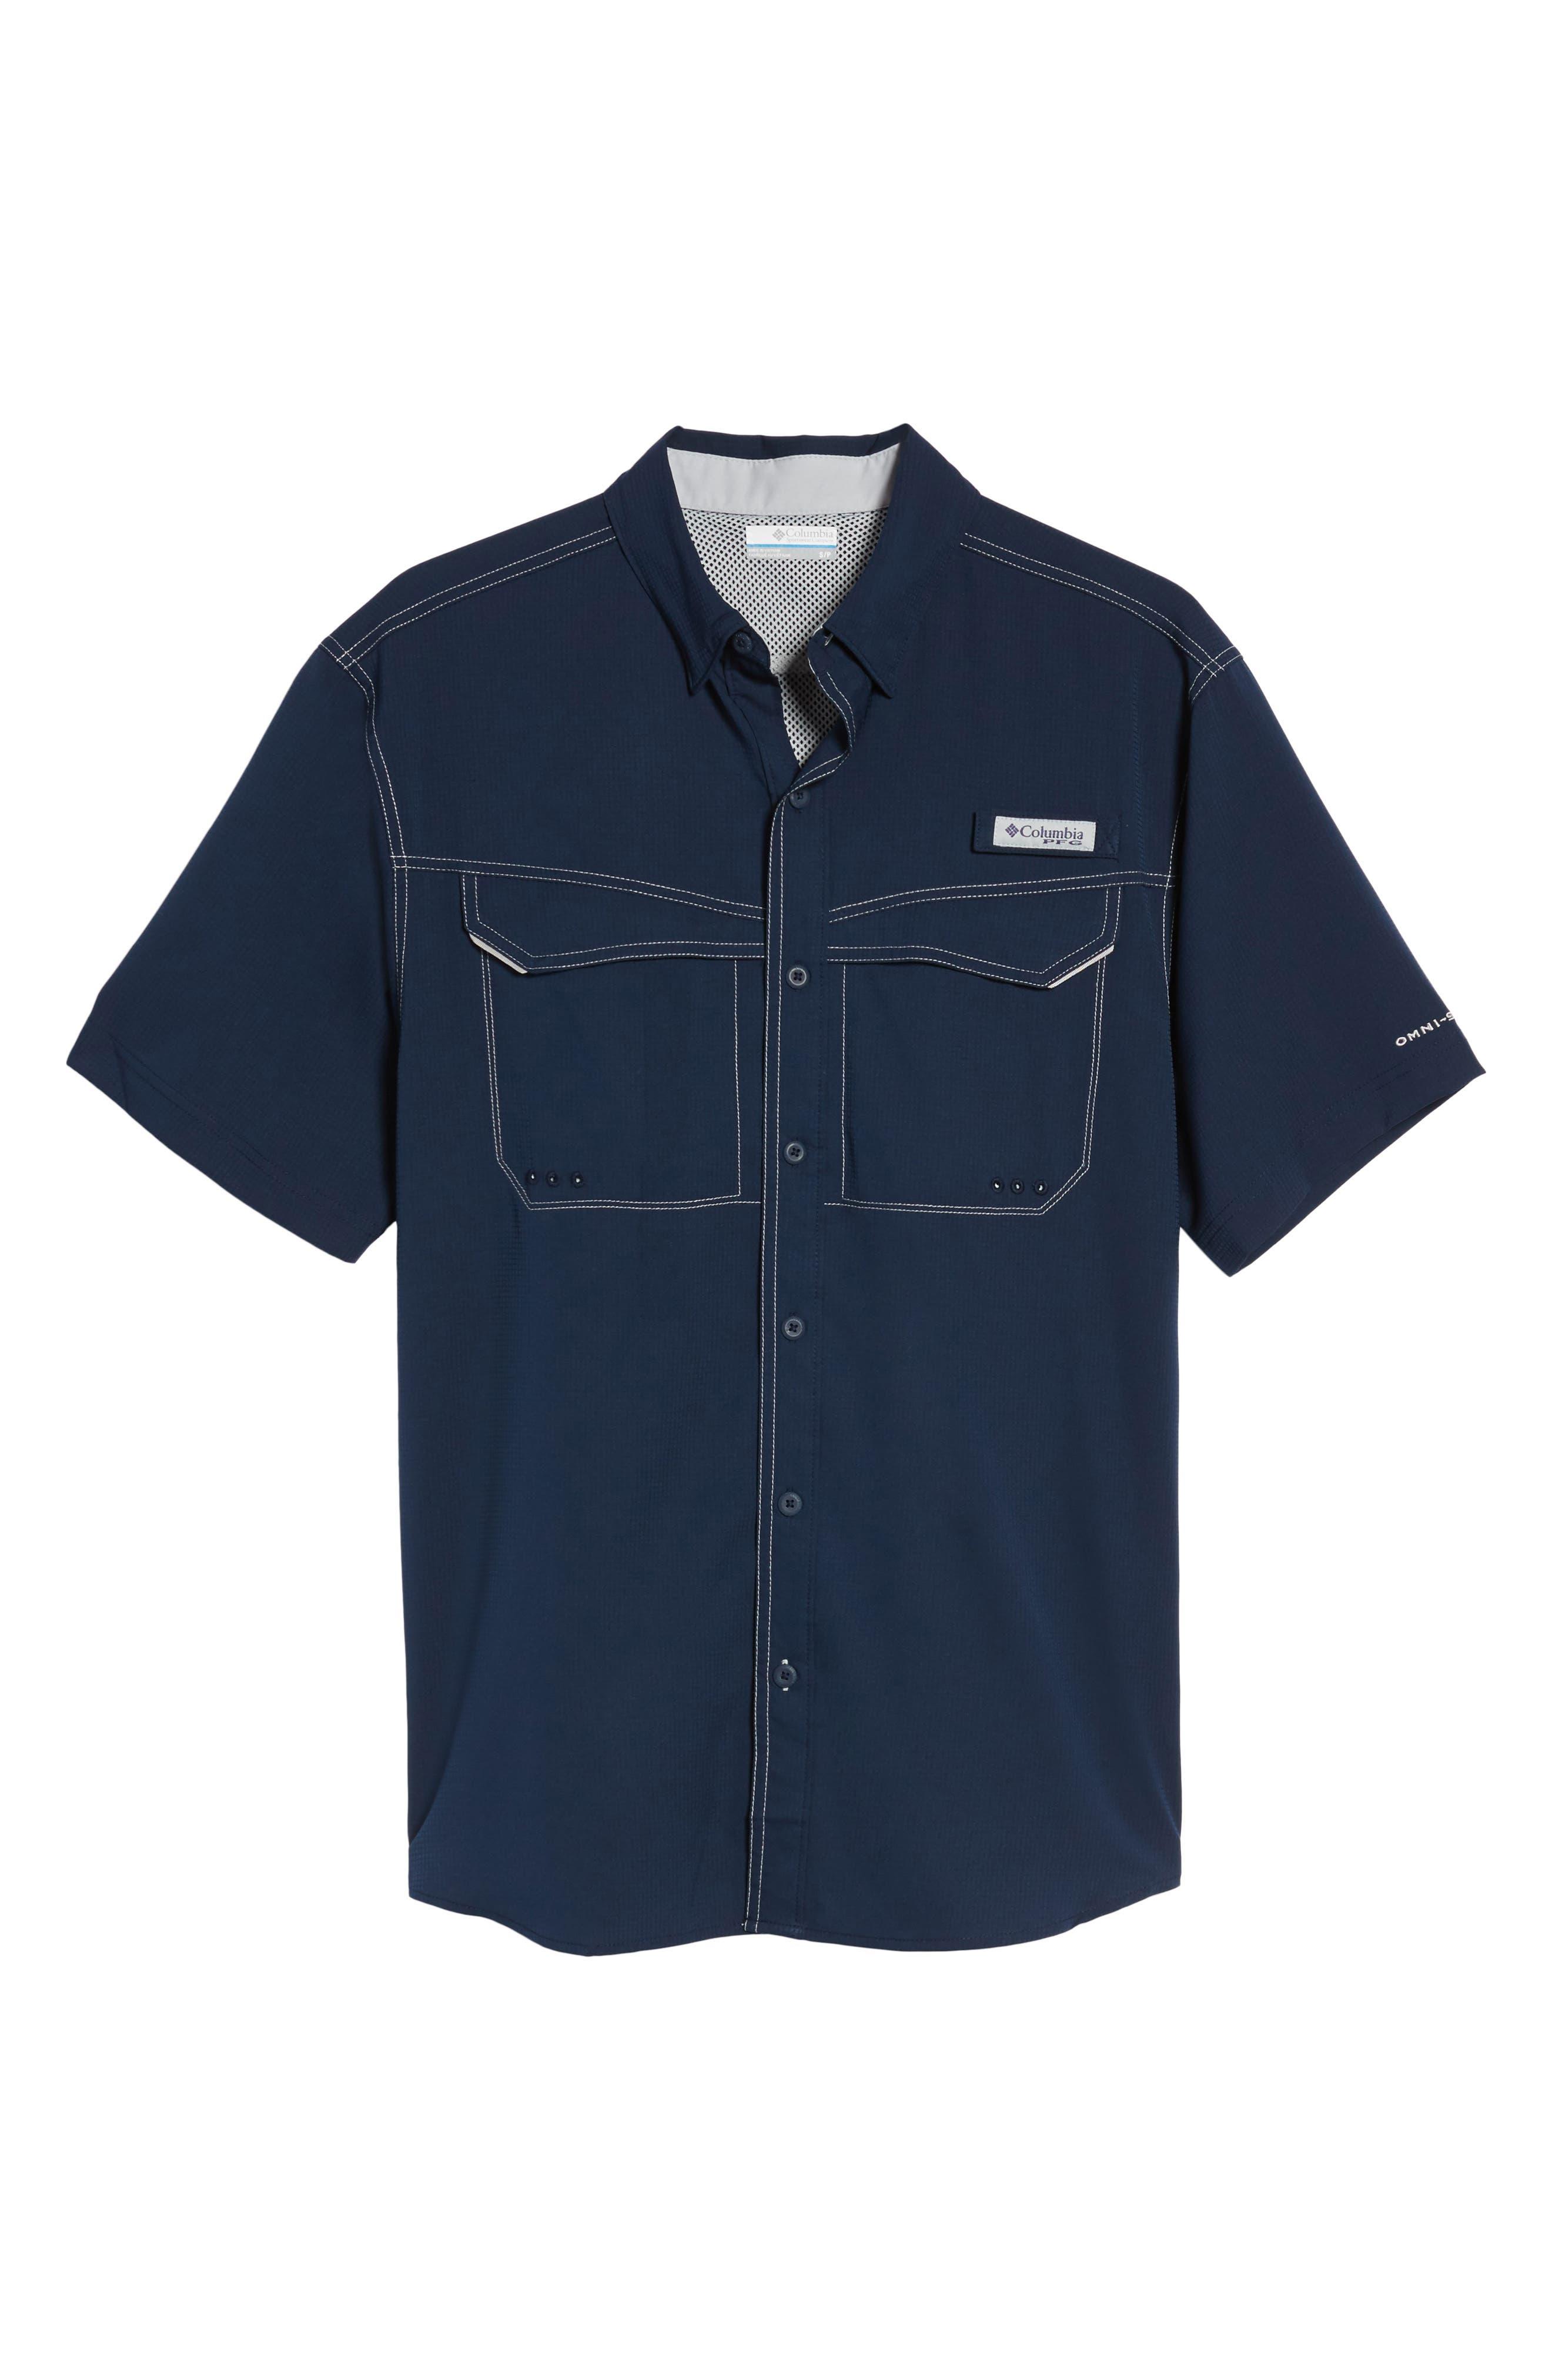 PFG Low Drag Offshore Woven Shirt,                             Alternate thumbnail 27, color,